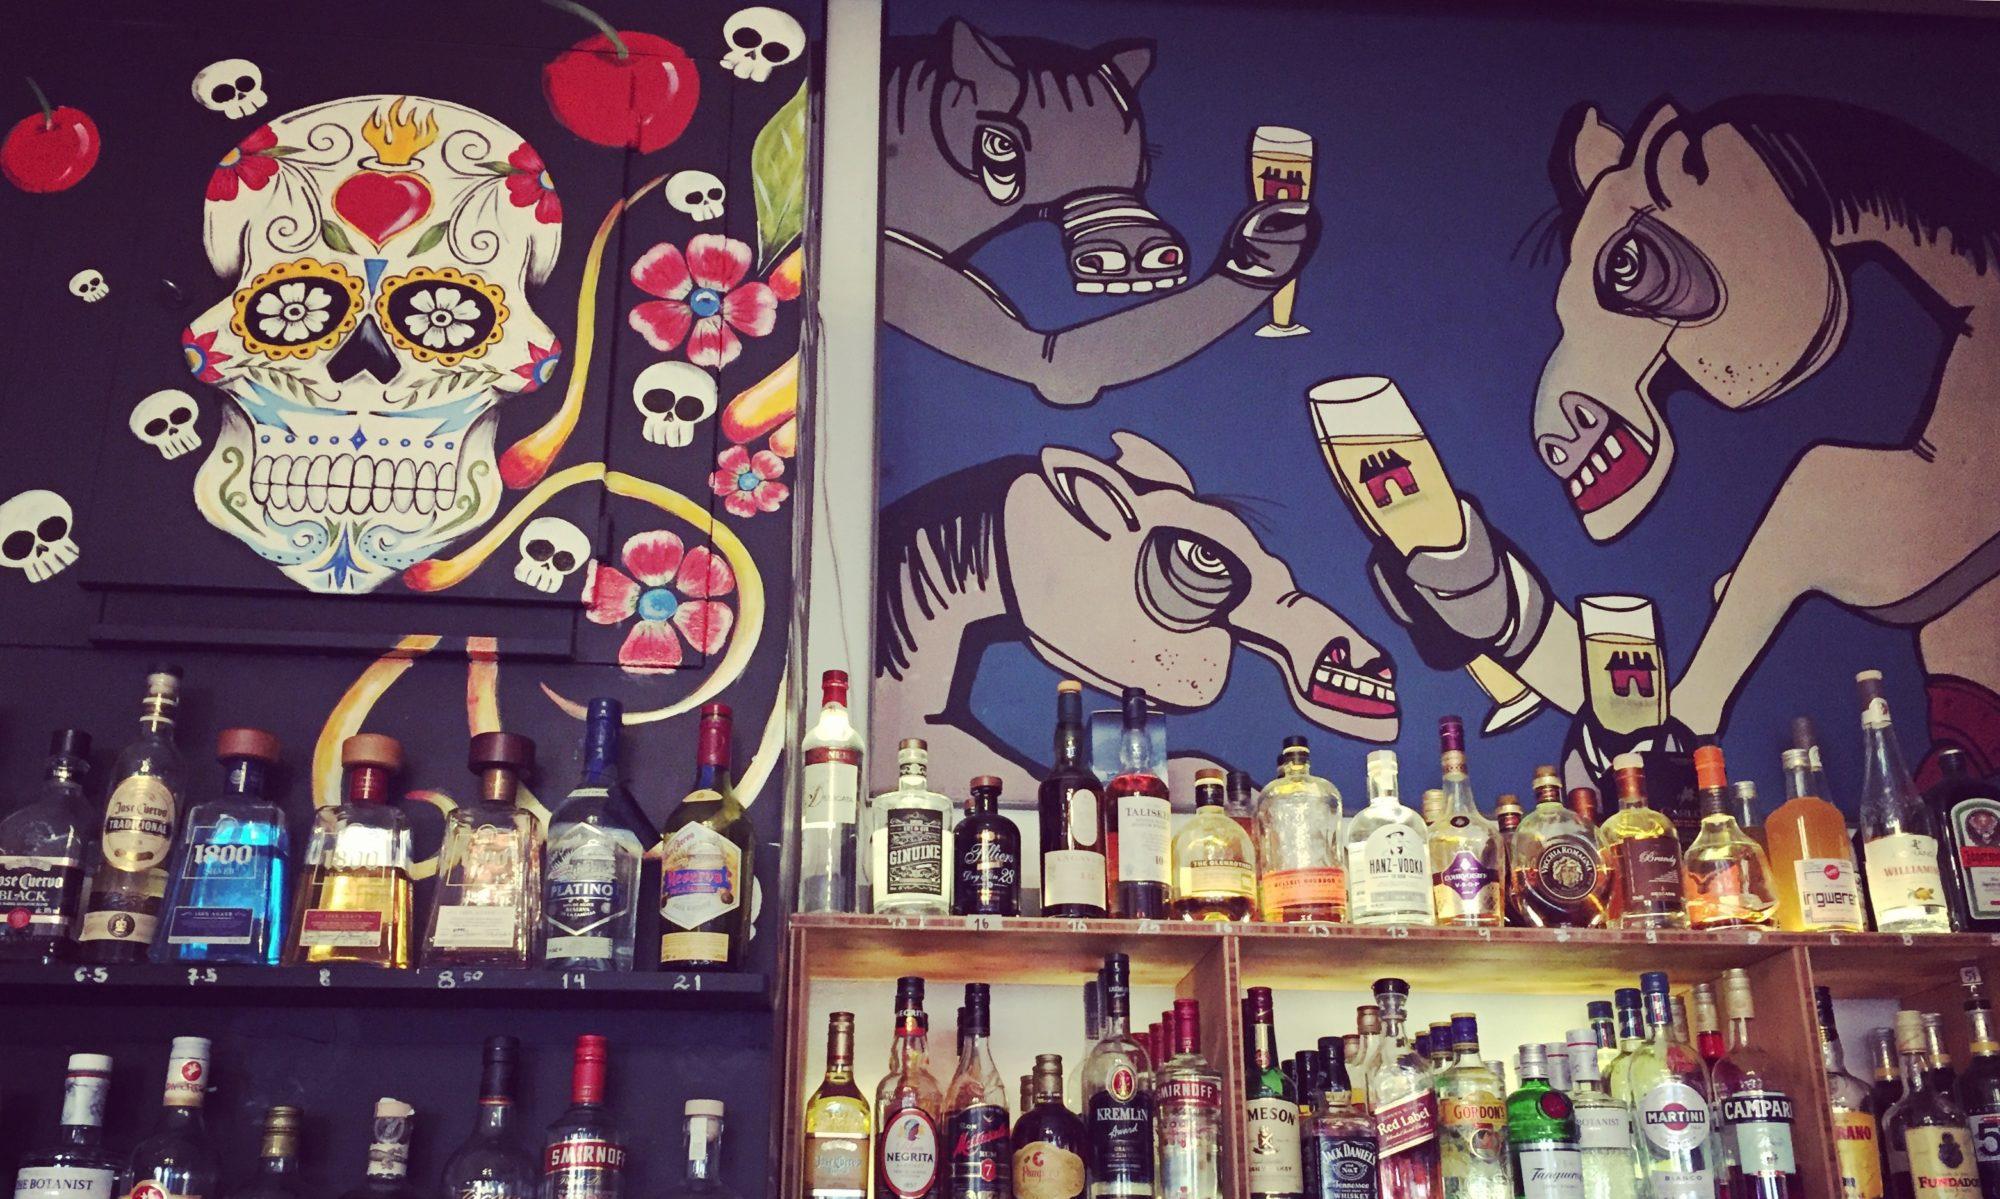 Les Amis Bar & Wohnzimmer